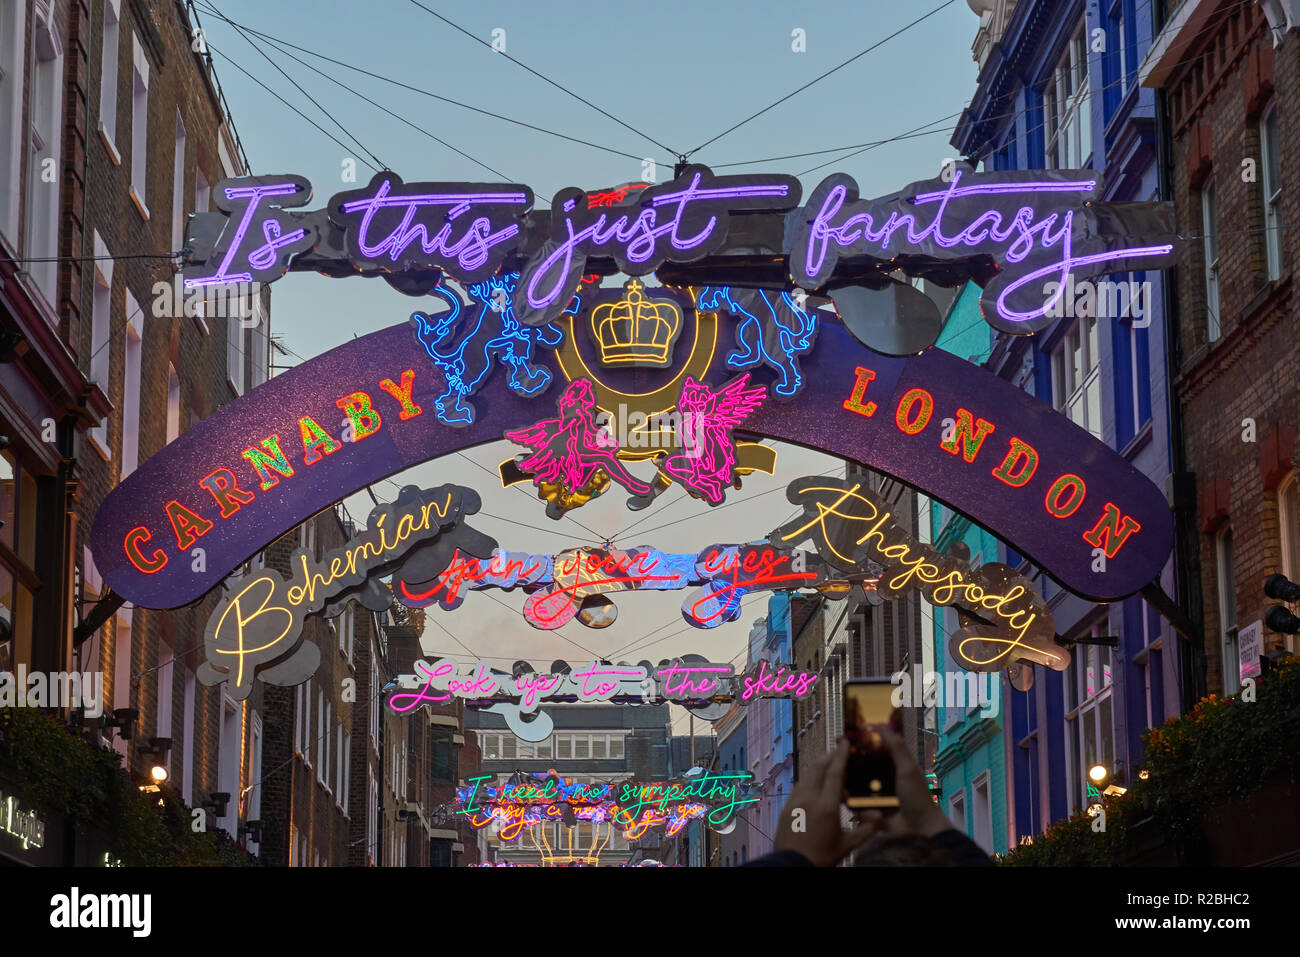 Christmas decorations  Carnaby Sreet London 2018 - Stock Image